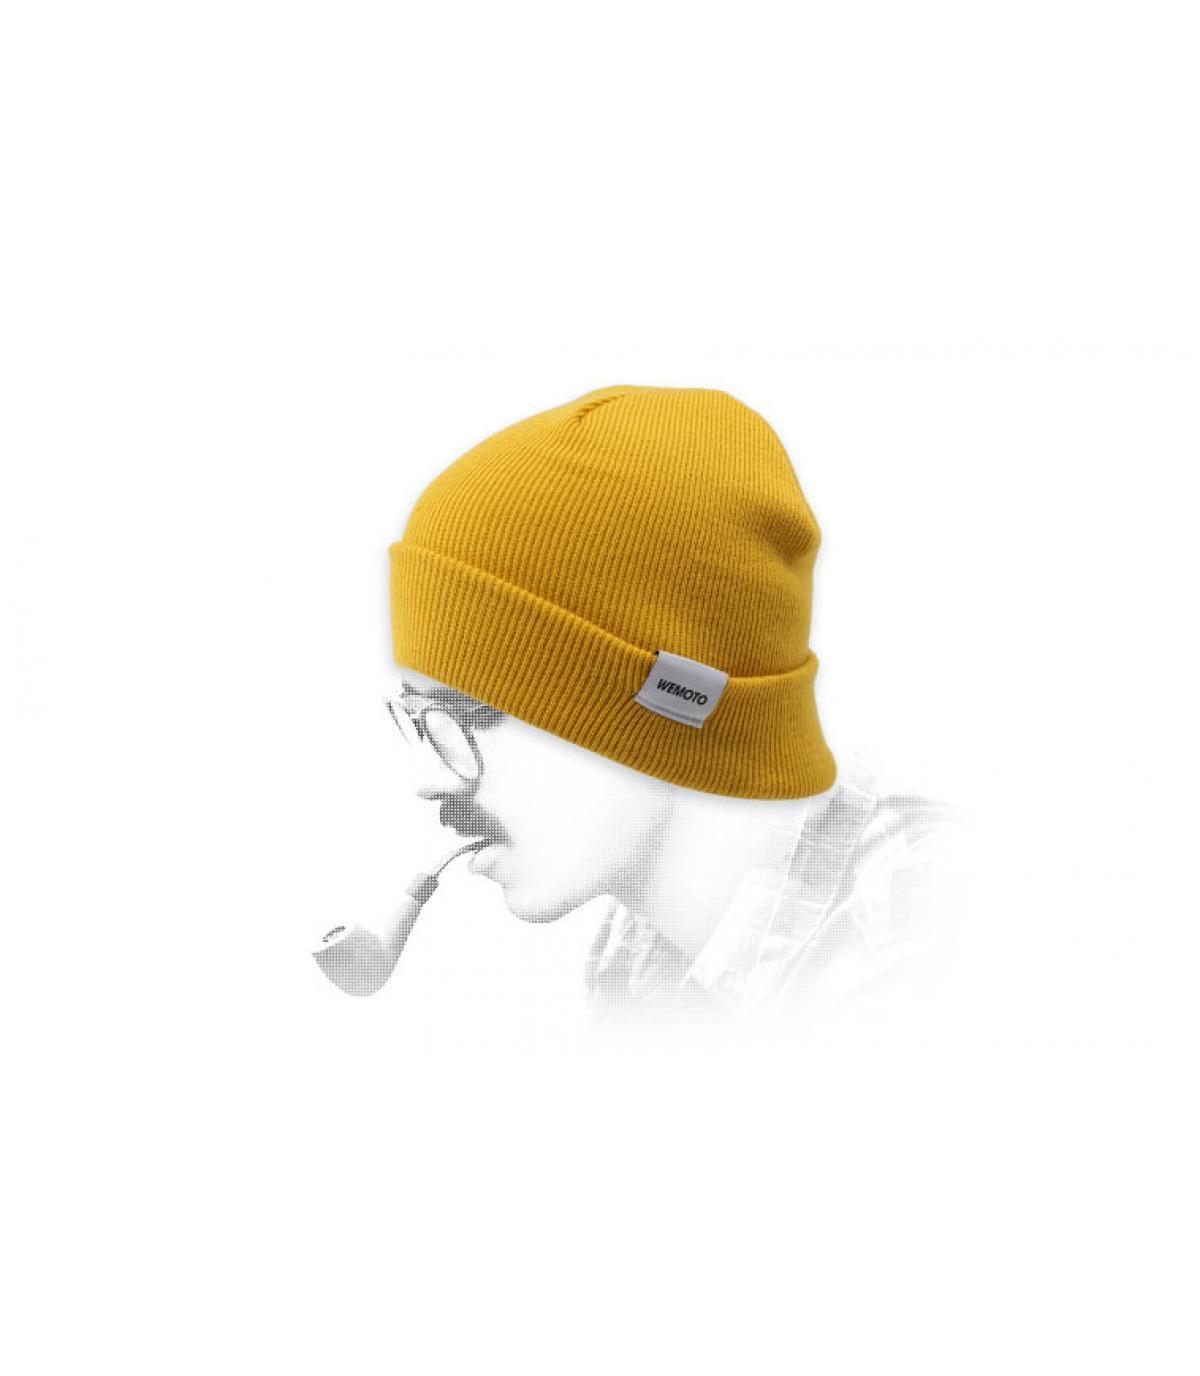 bonnet revers jaune Wemoto